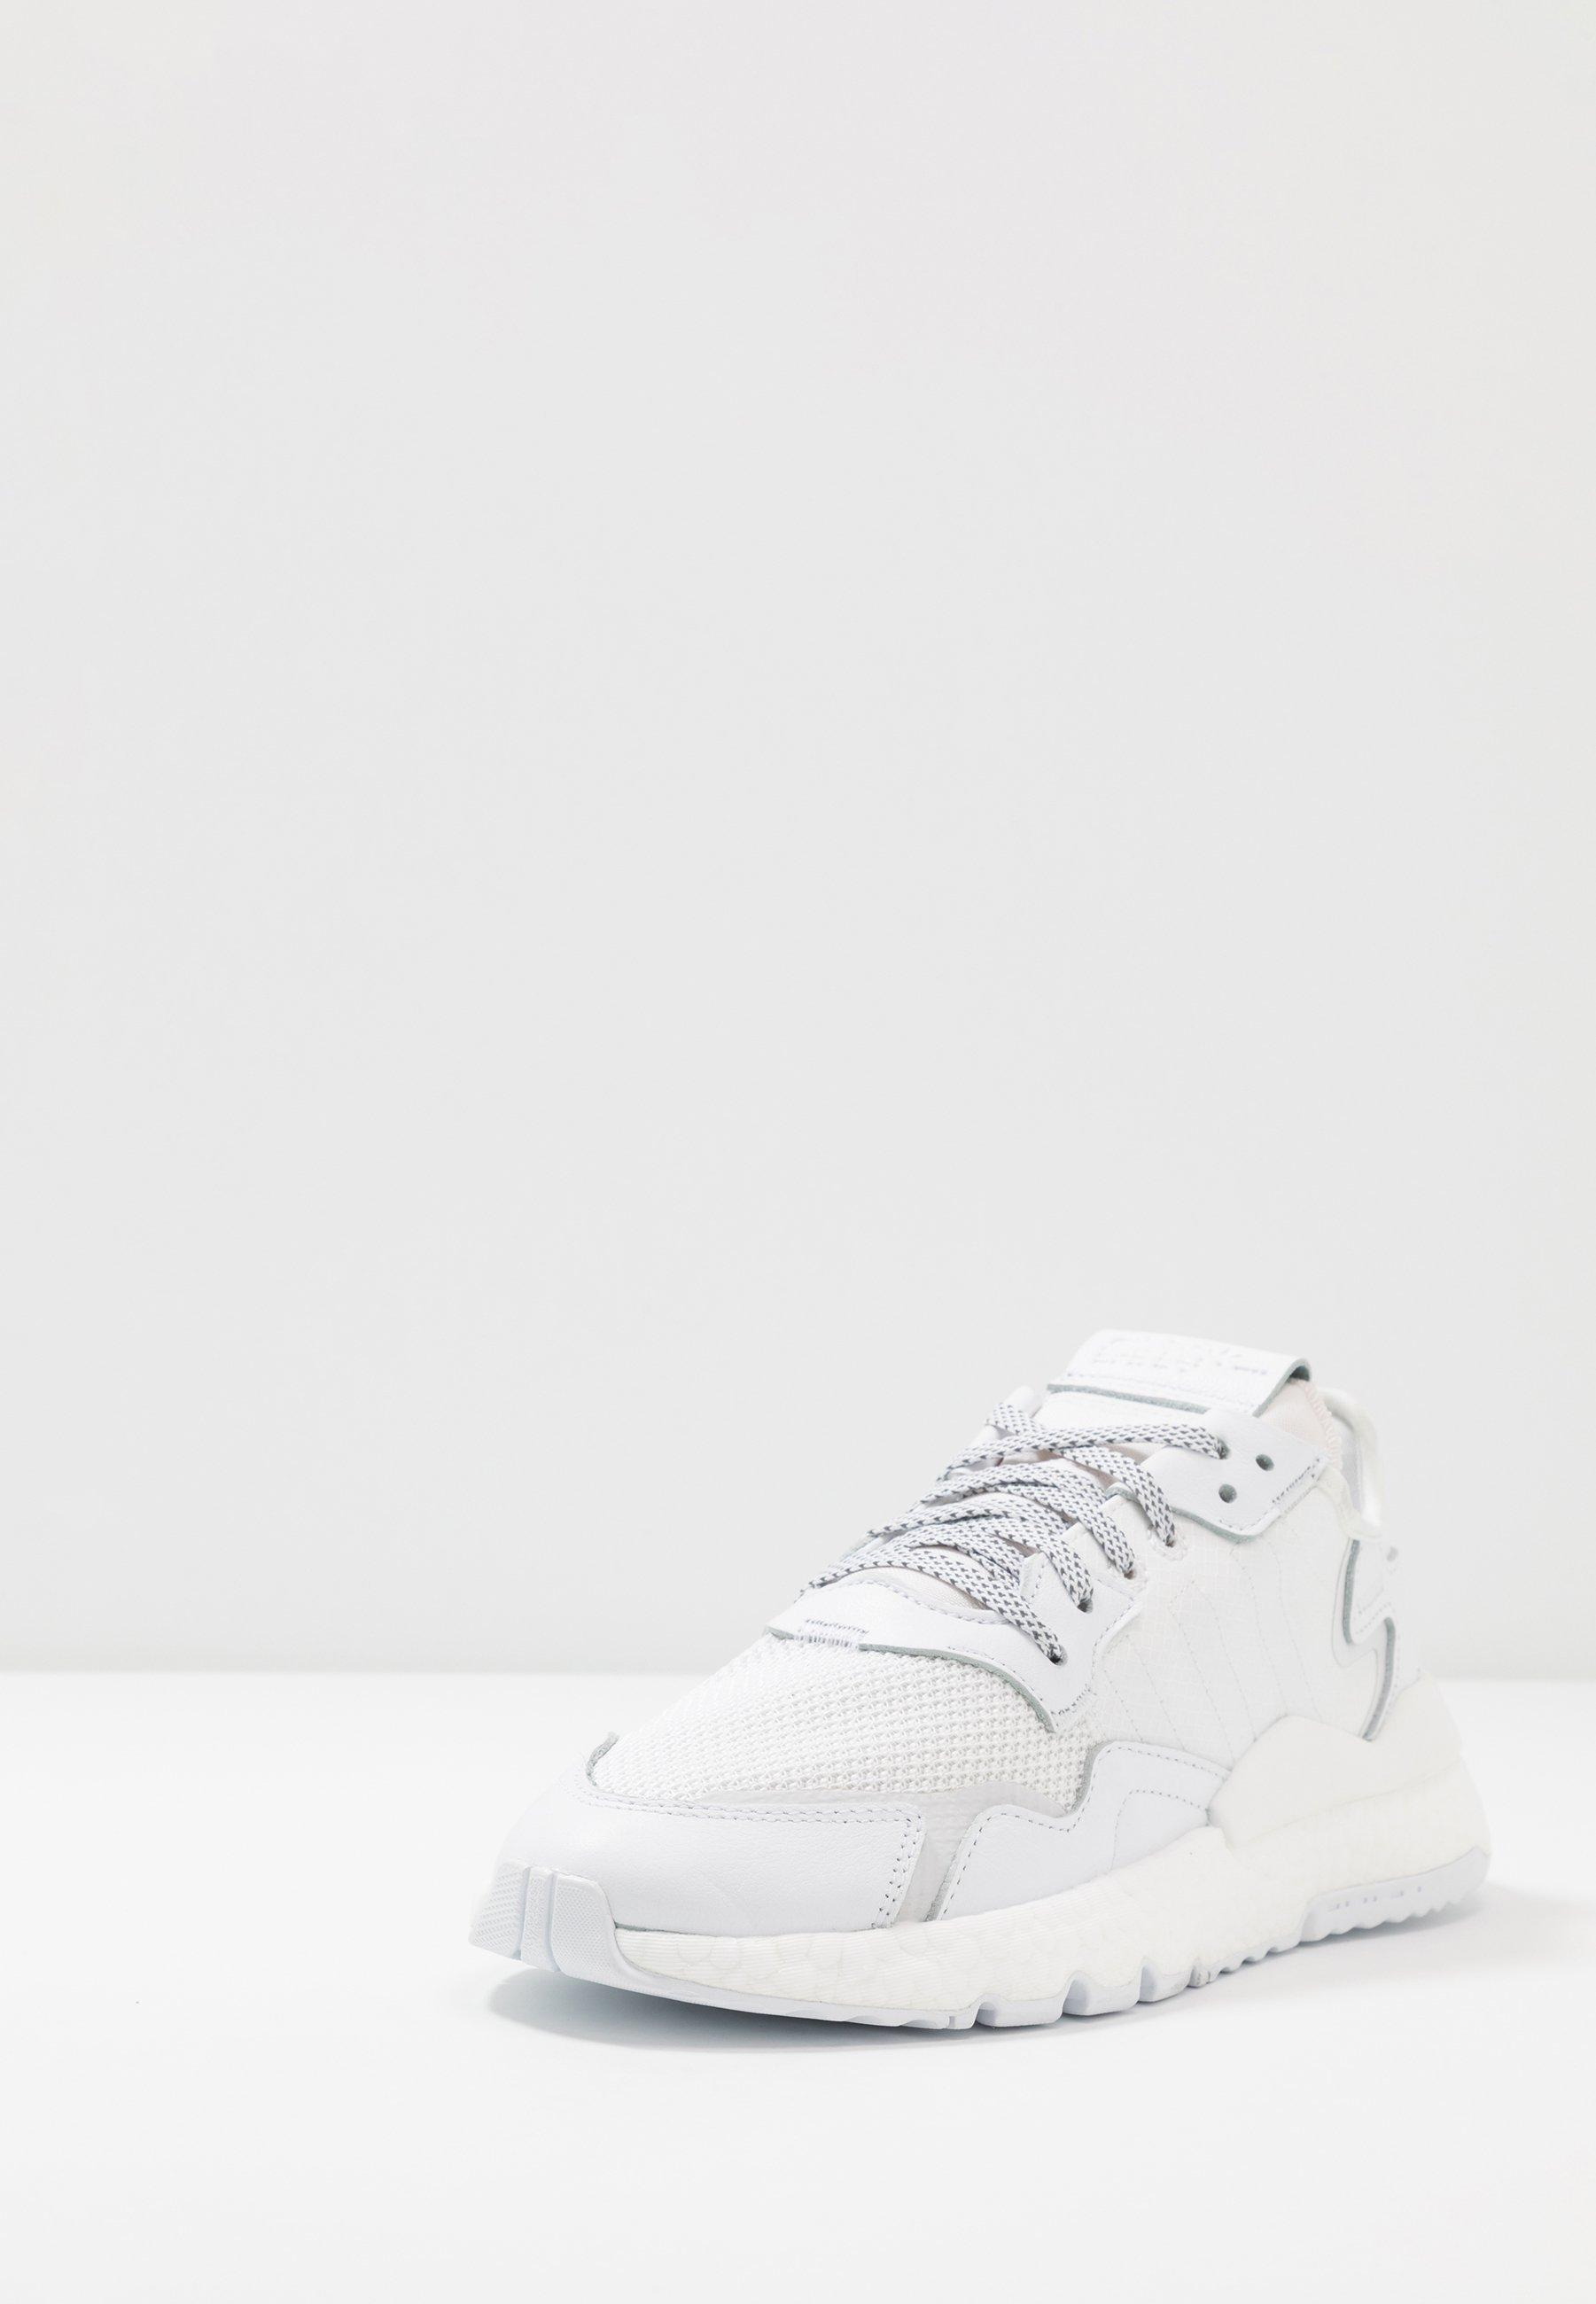 100% authentique Meilleurs prix adidas Originals NITE JOGGER Baskets basses footwear white 2Yrzw